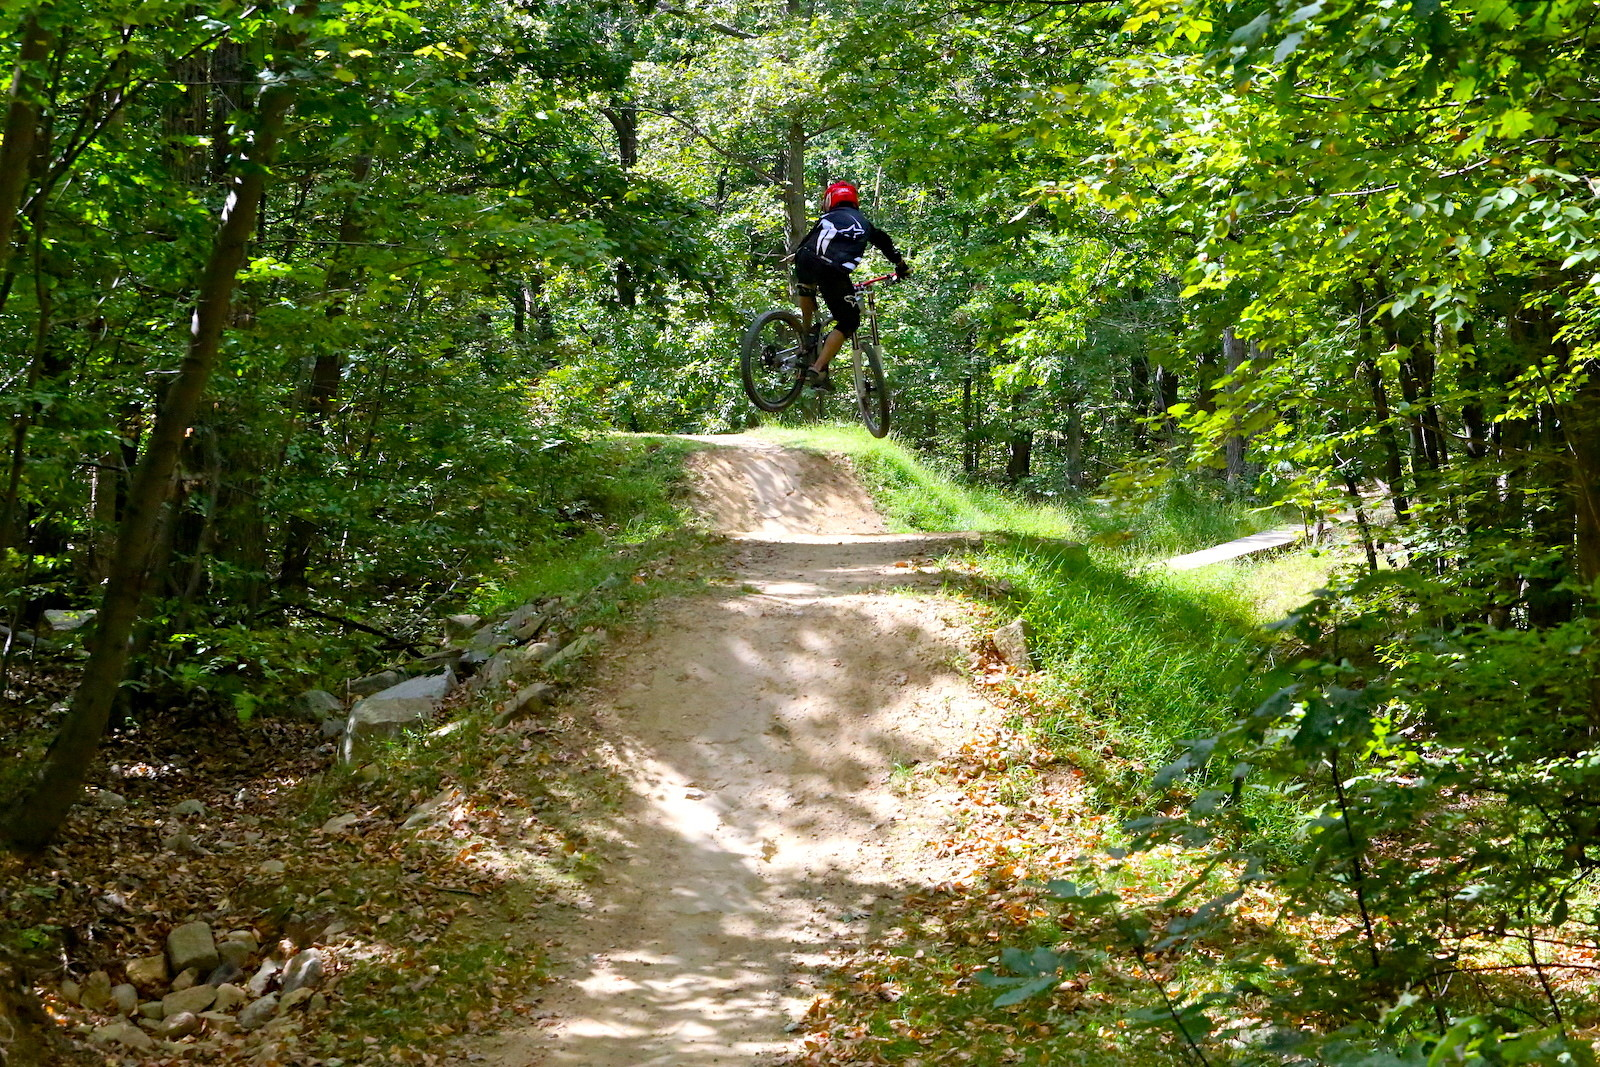 Upper Dominion Whip - Austen_Paris - Mountain Biking Pictures - Vital MTB